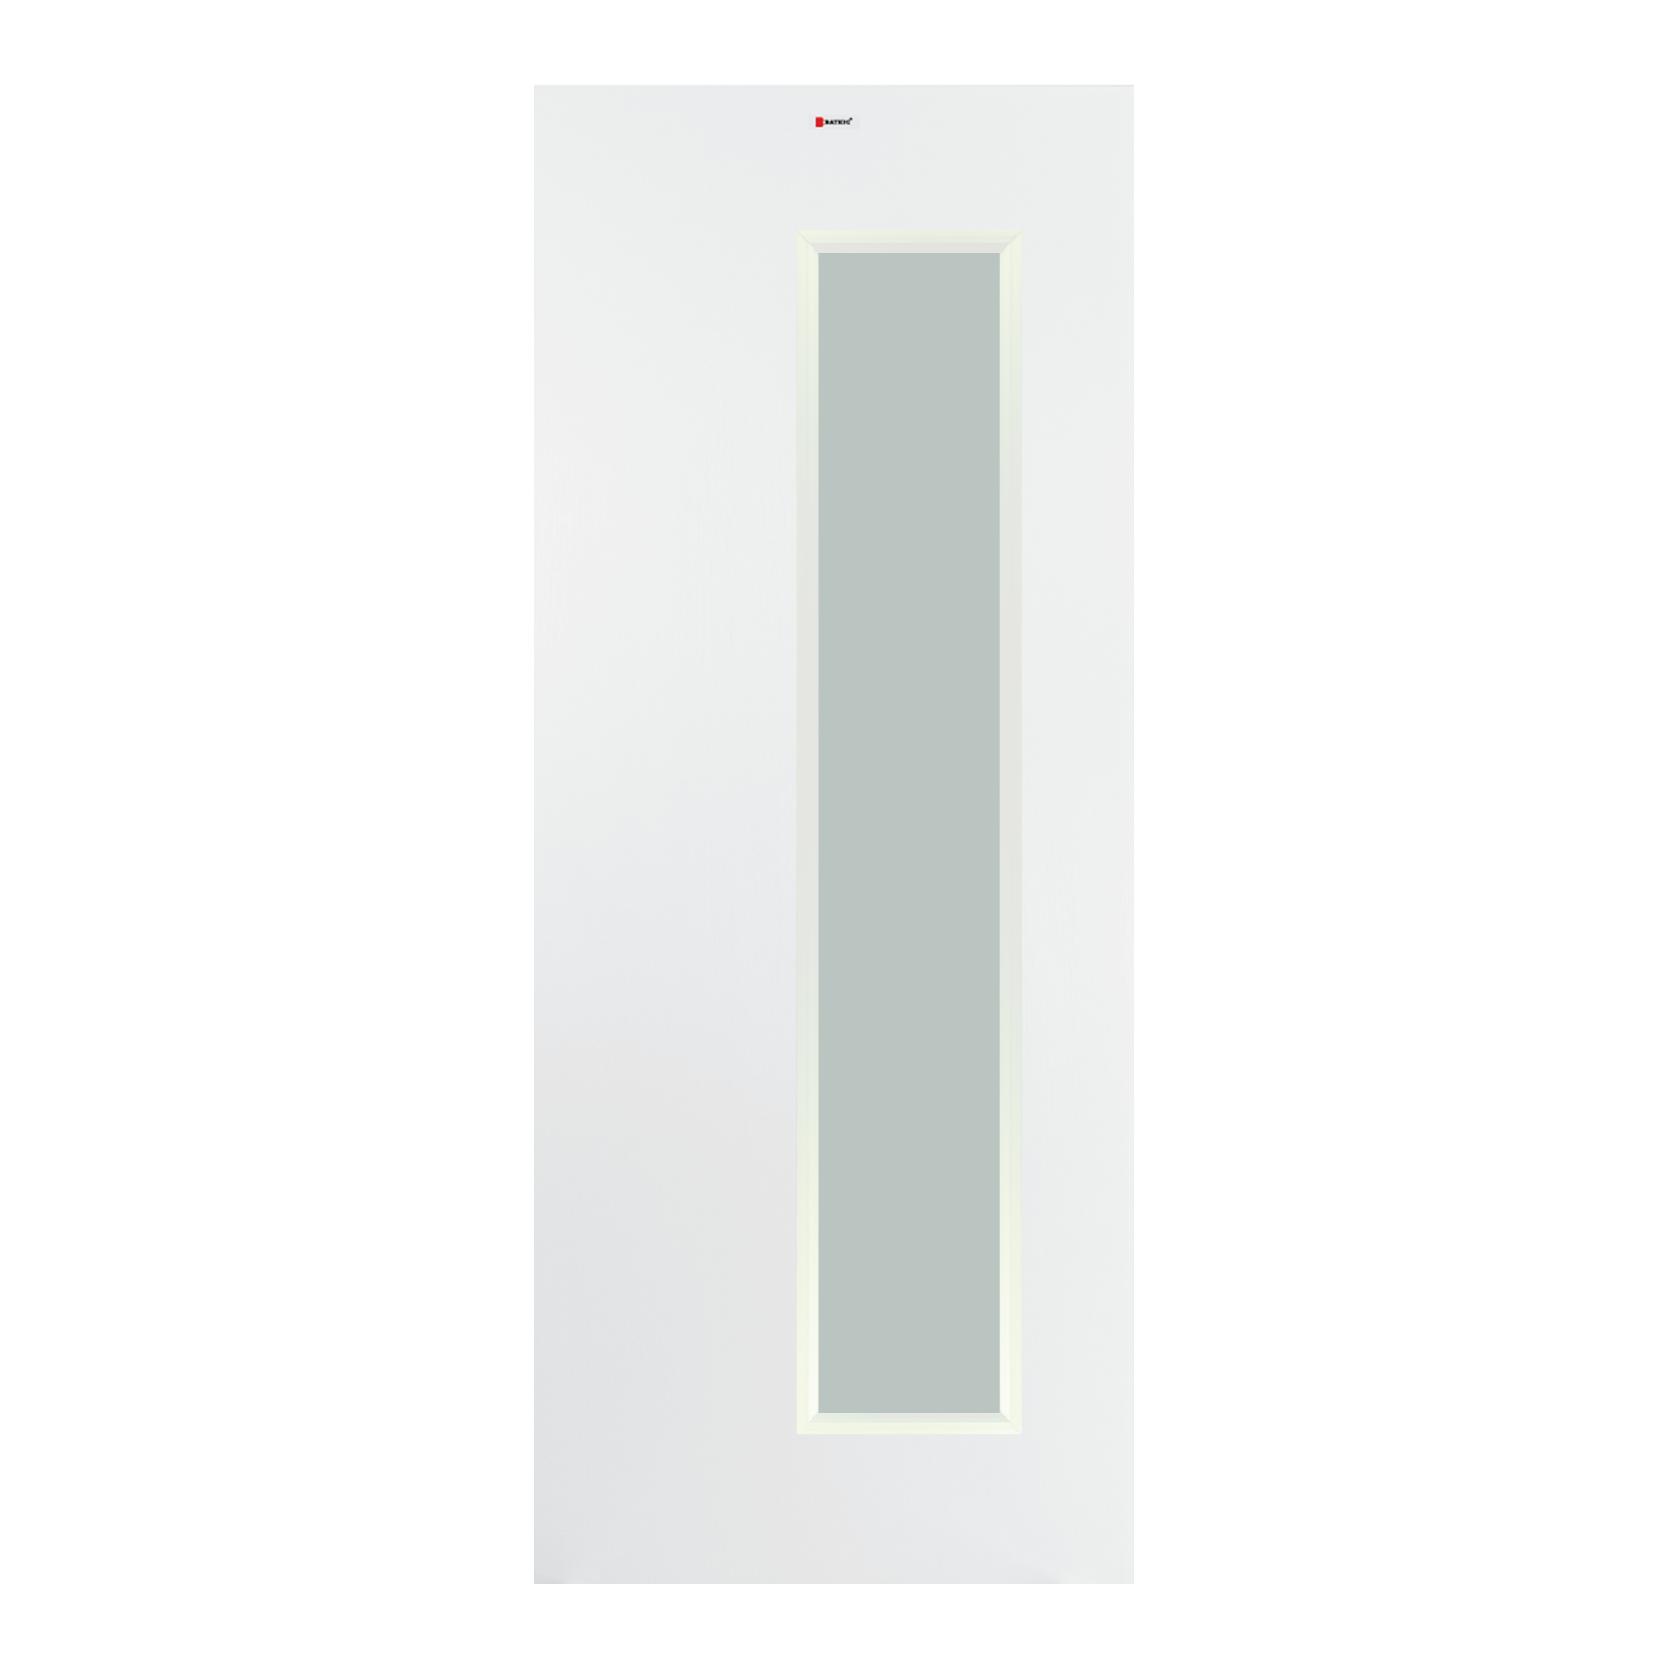 door-wpc-bathic-bwg05-grainwhite-1